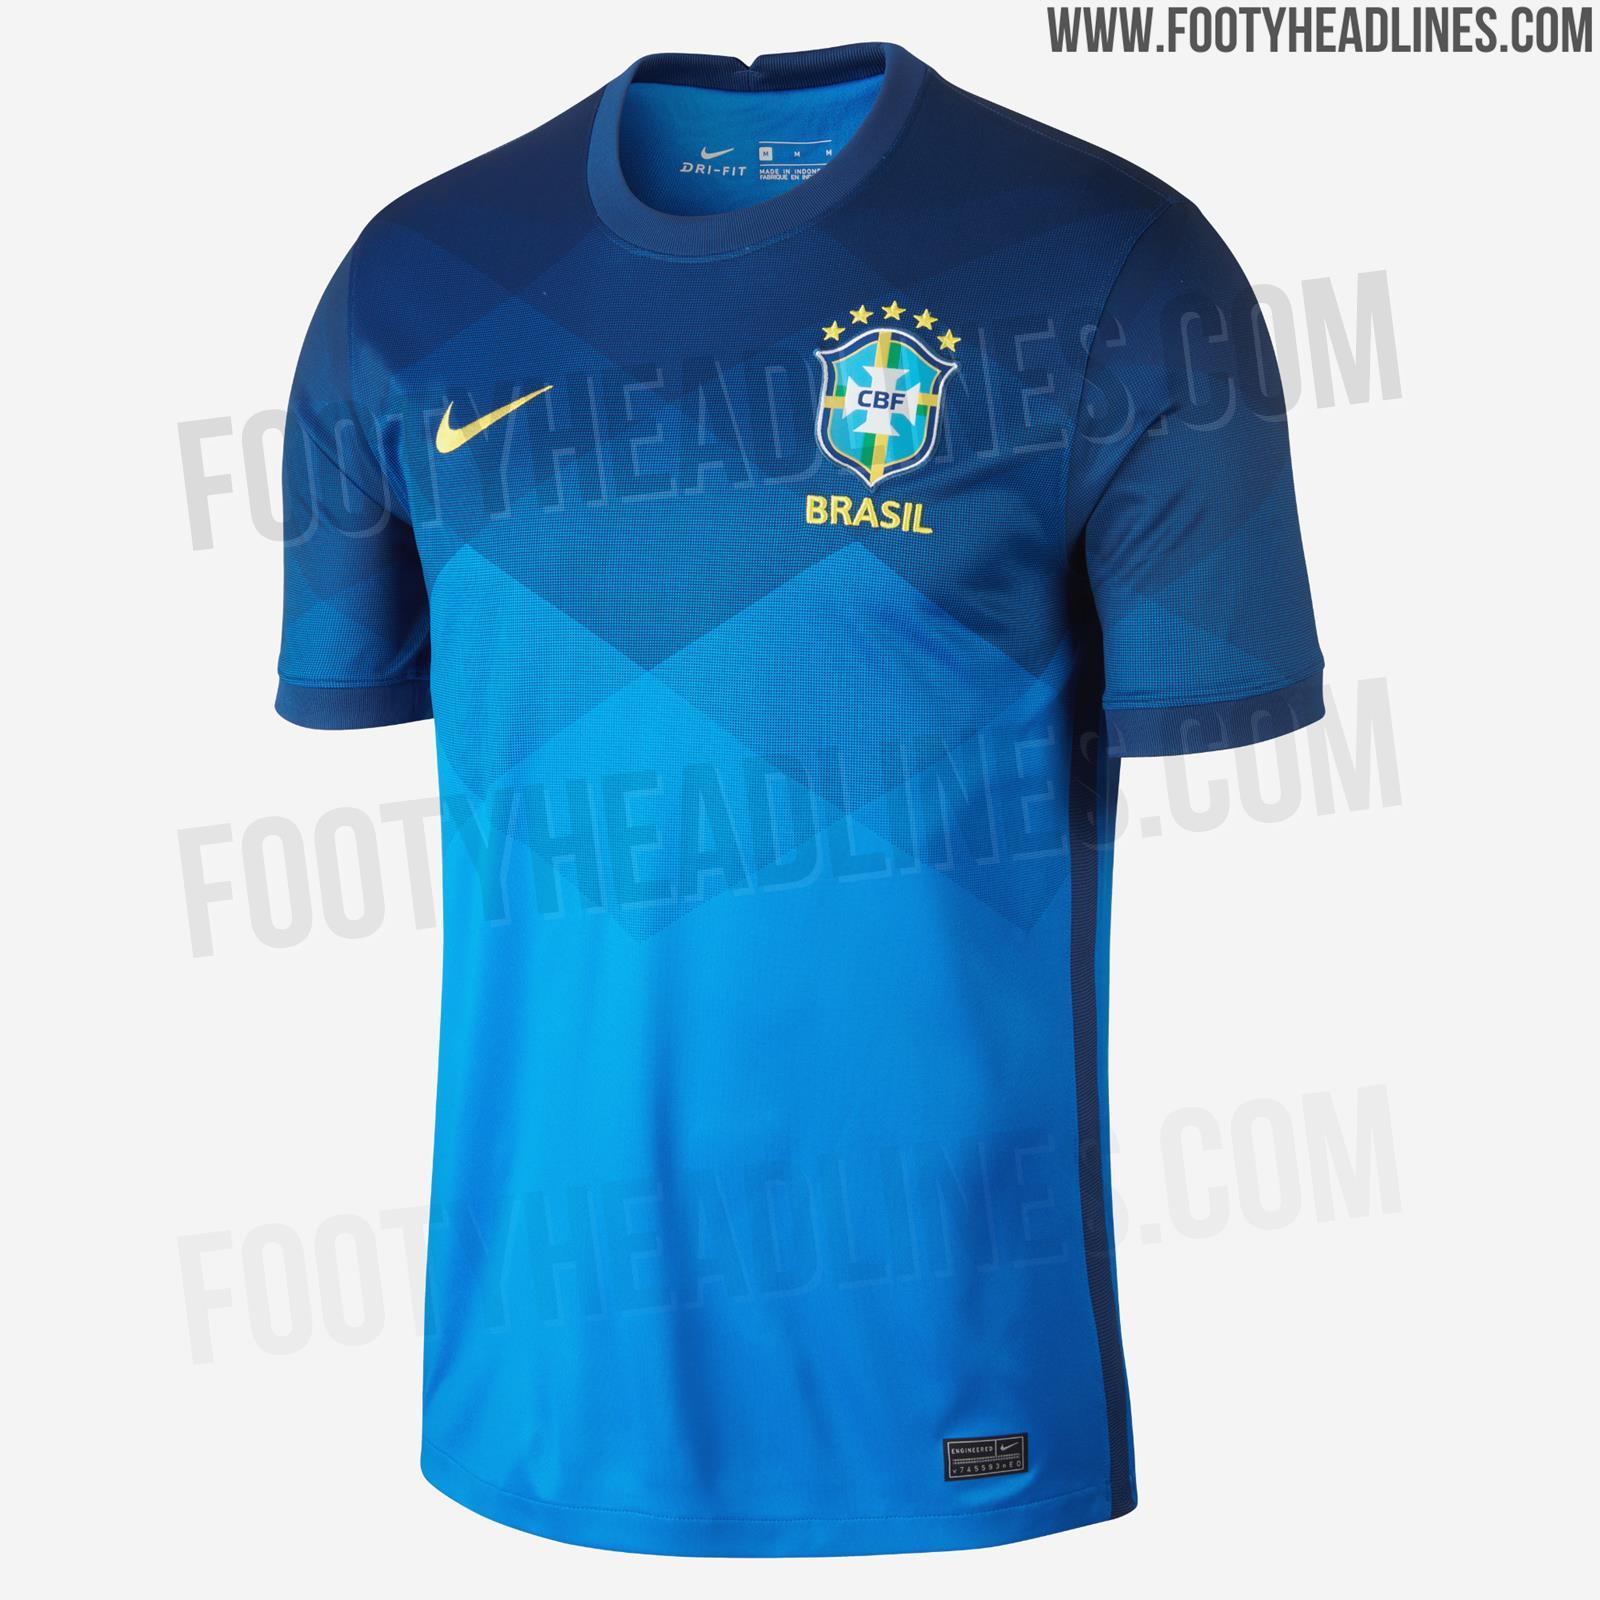 brazil-2020-away-kit+%25282%2529.jpg